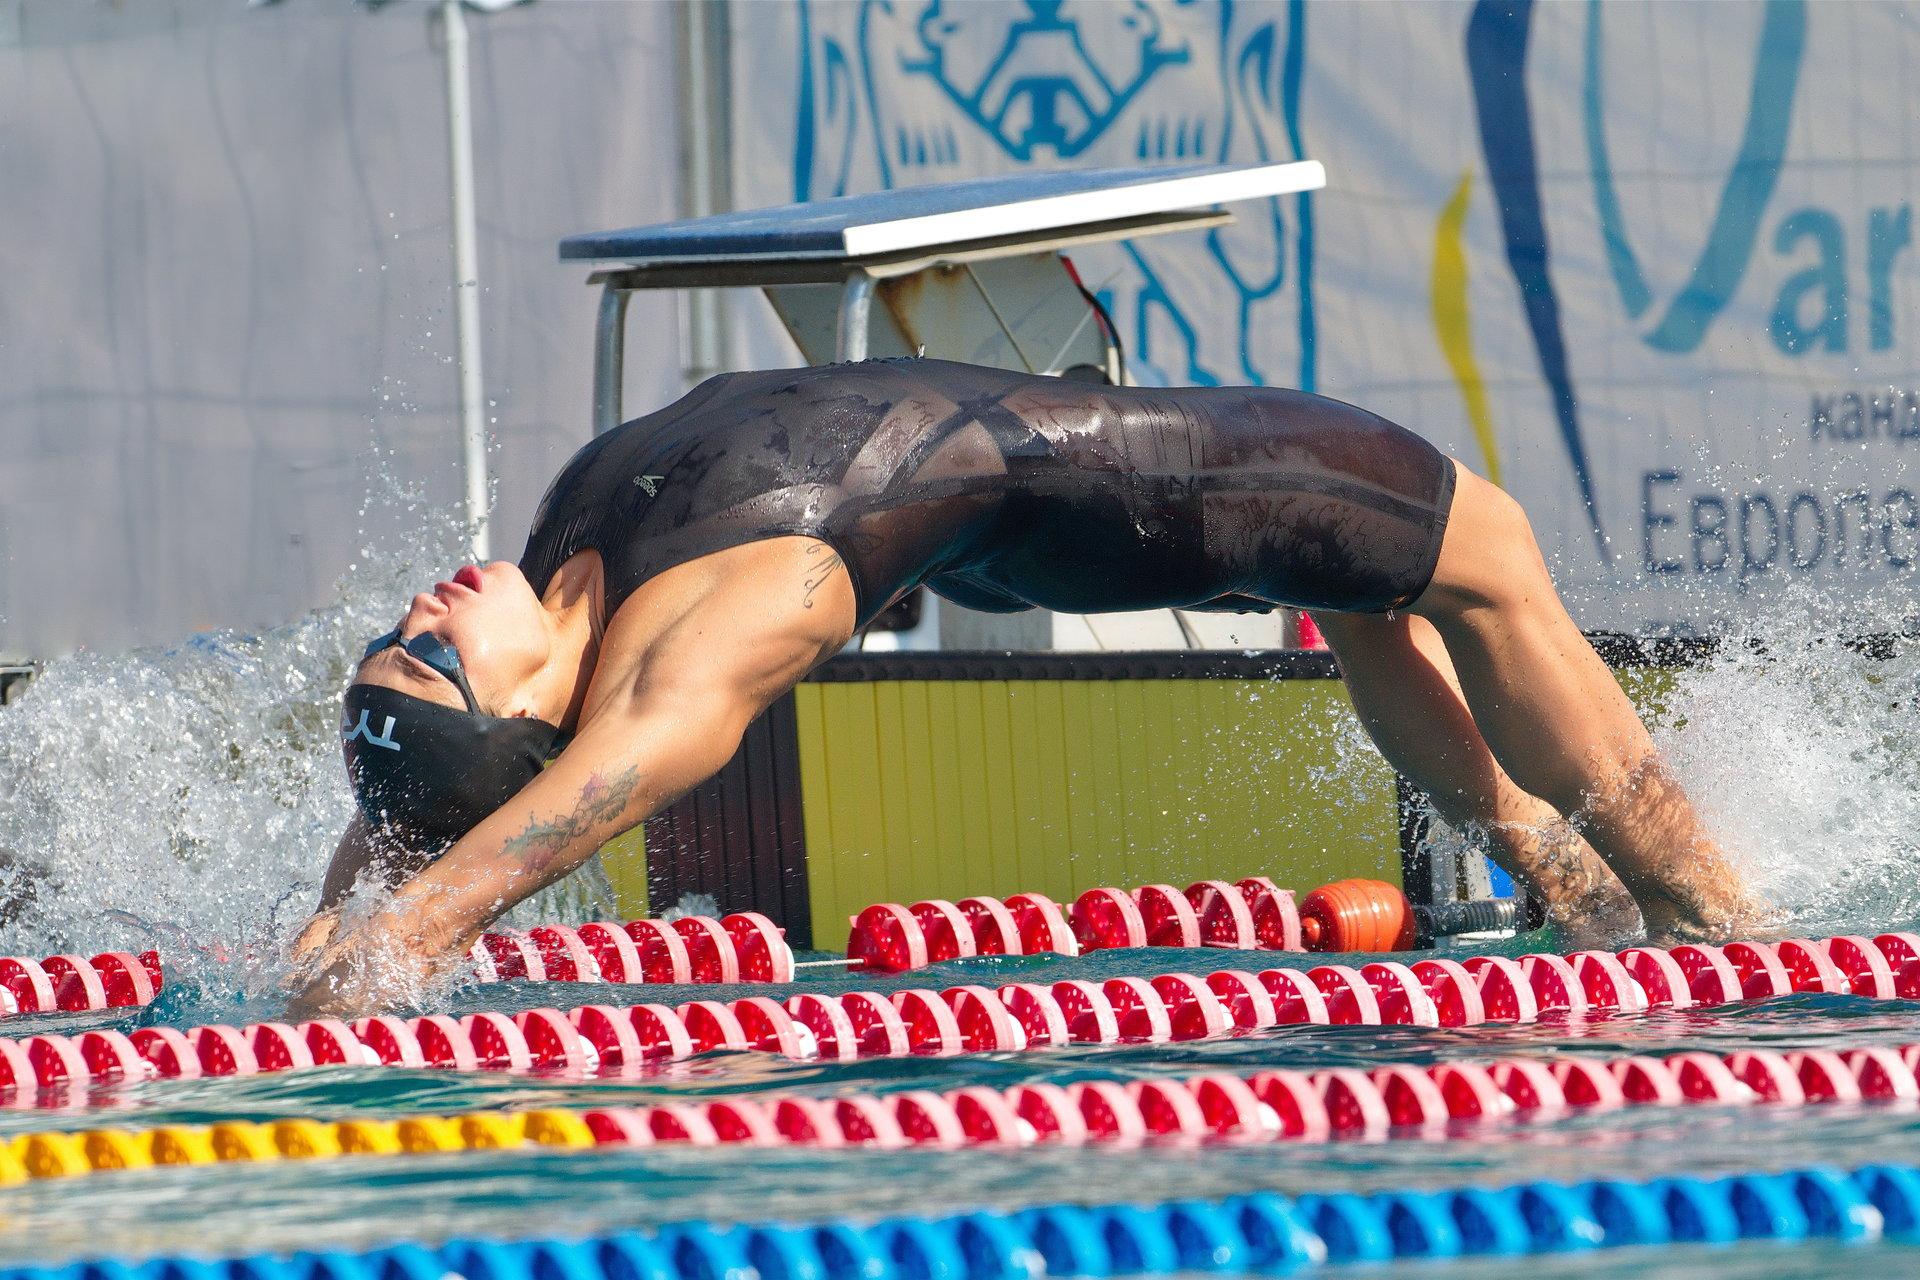 Photo in Sport | Author Nedelcho Nedelchev - mocker | PHOTO FORUM